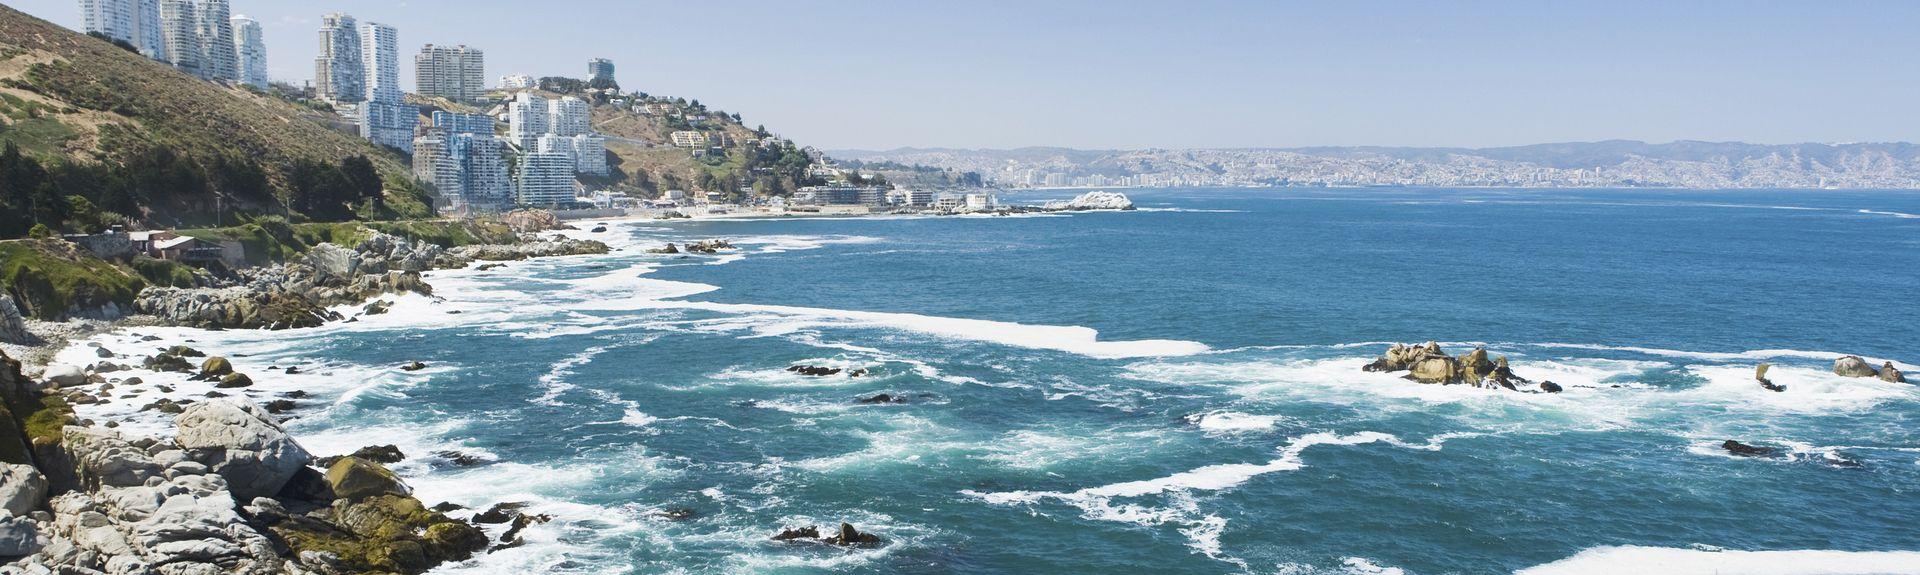 Viña del Mar, Valparaíso, Chili